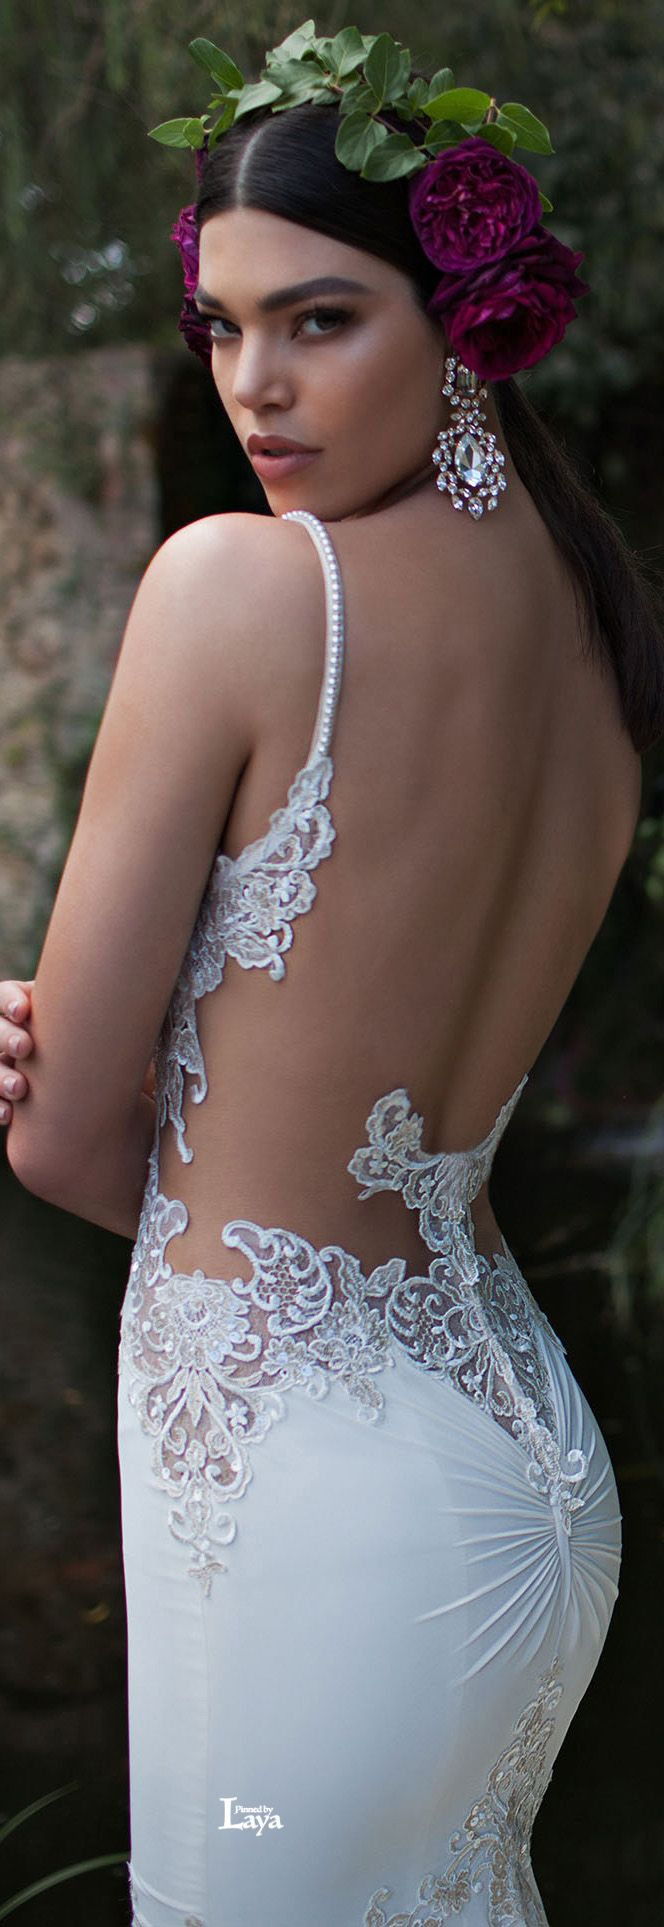 ♡ Wedding Story ♡ / Berta S/S 2015 Bridal